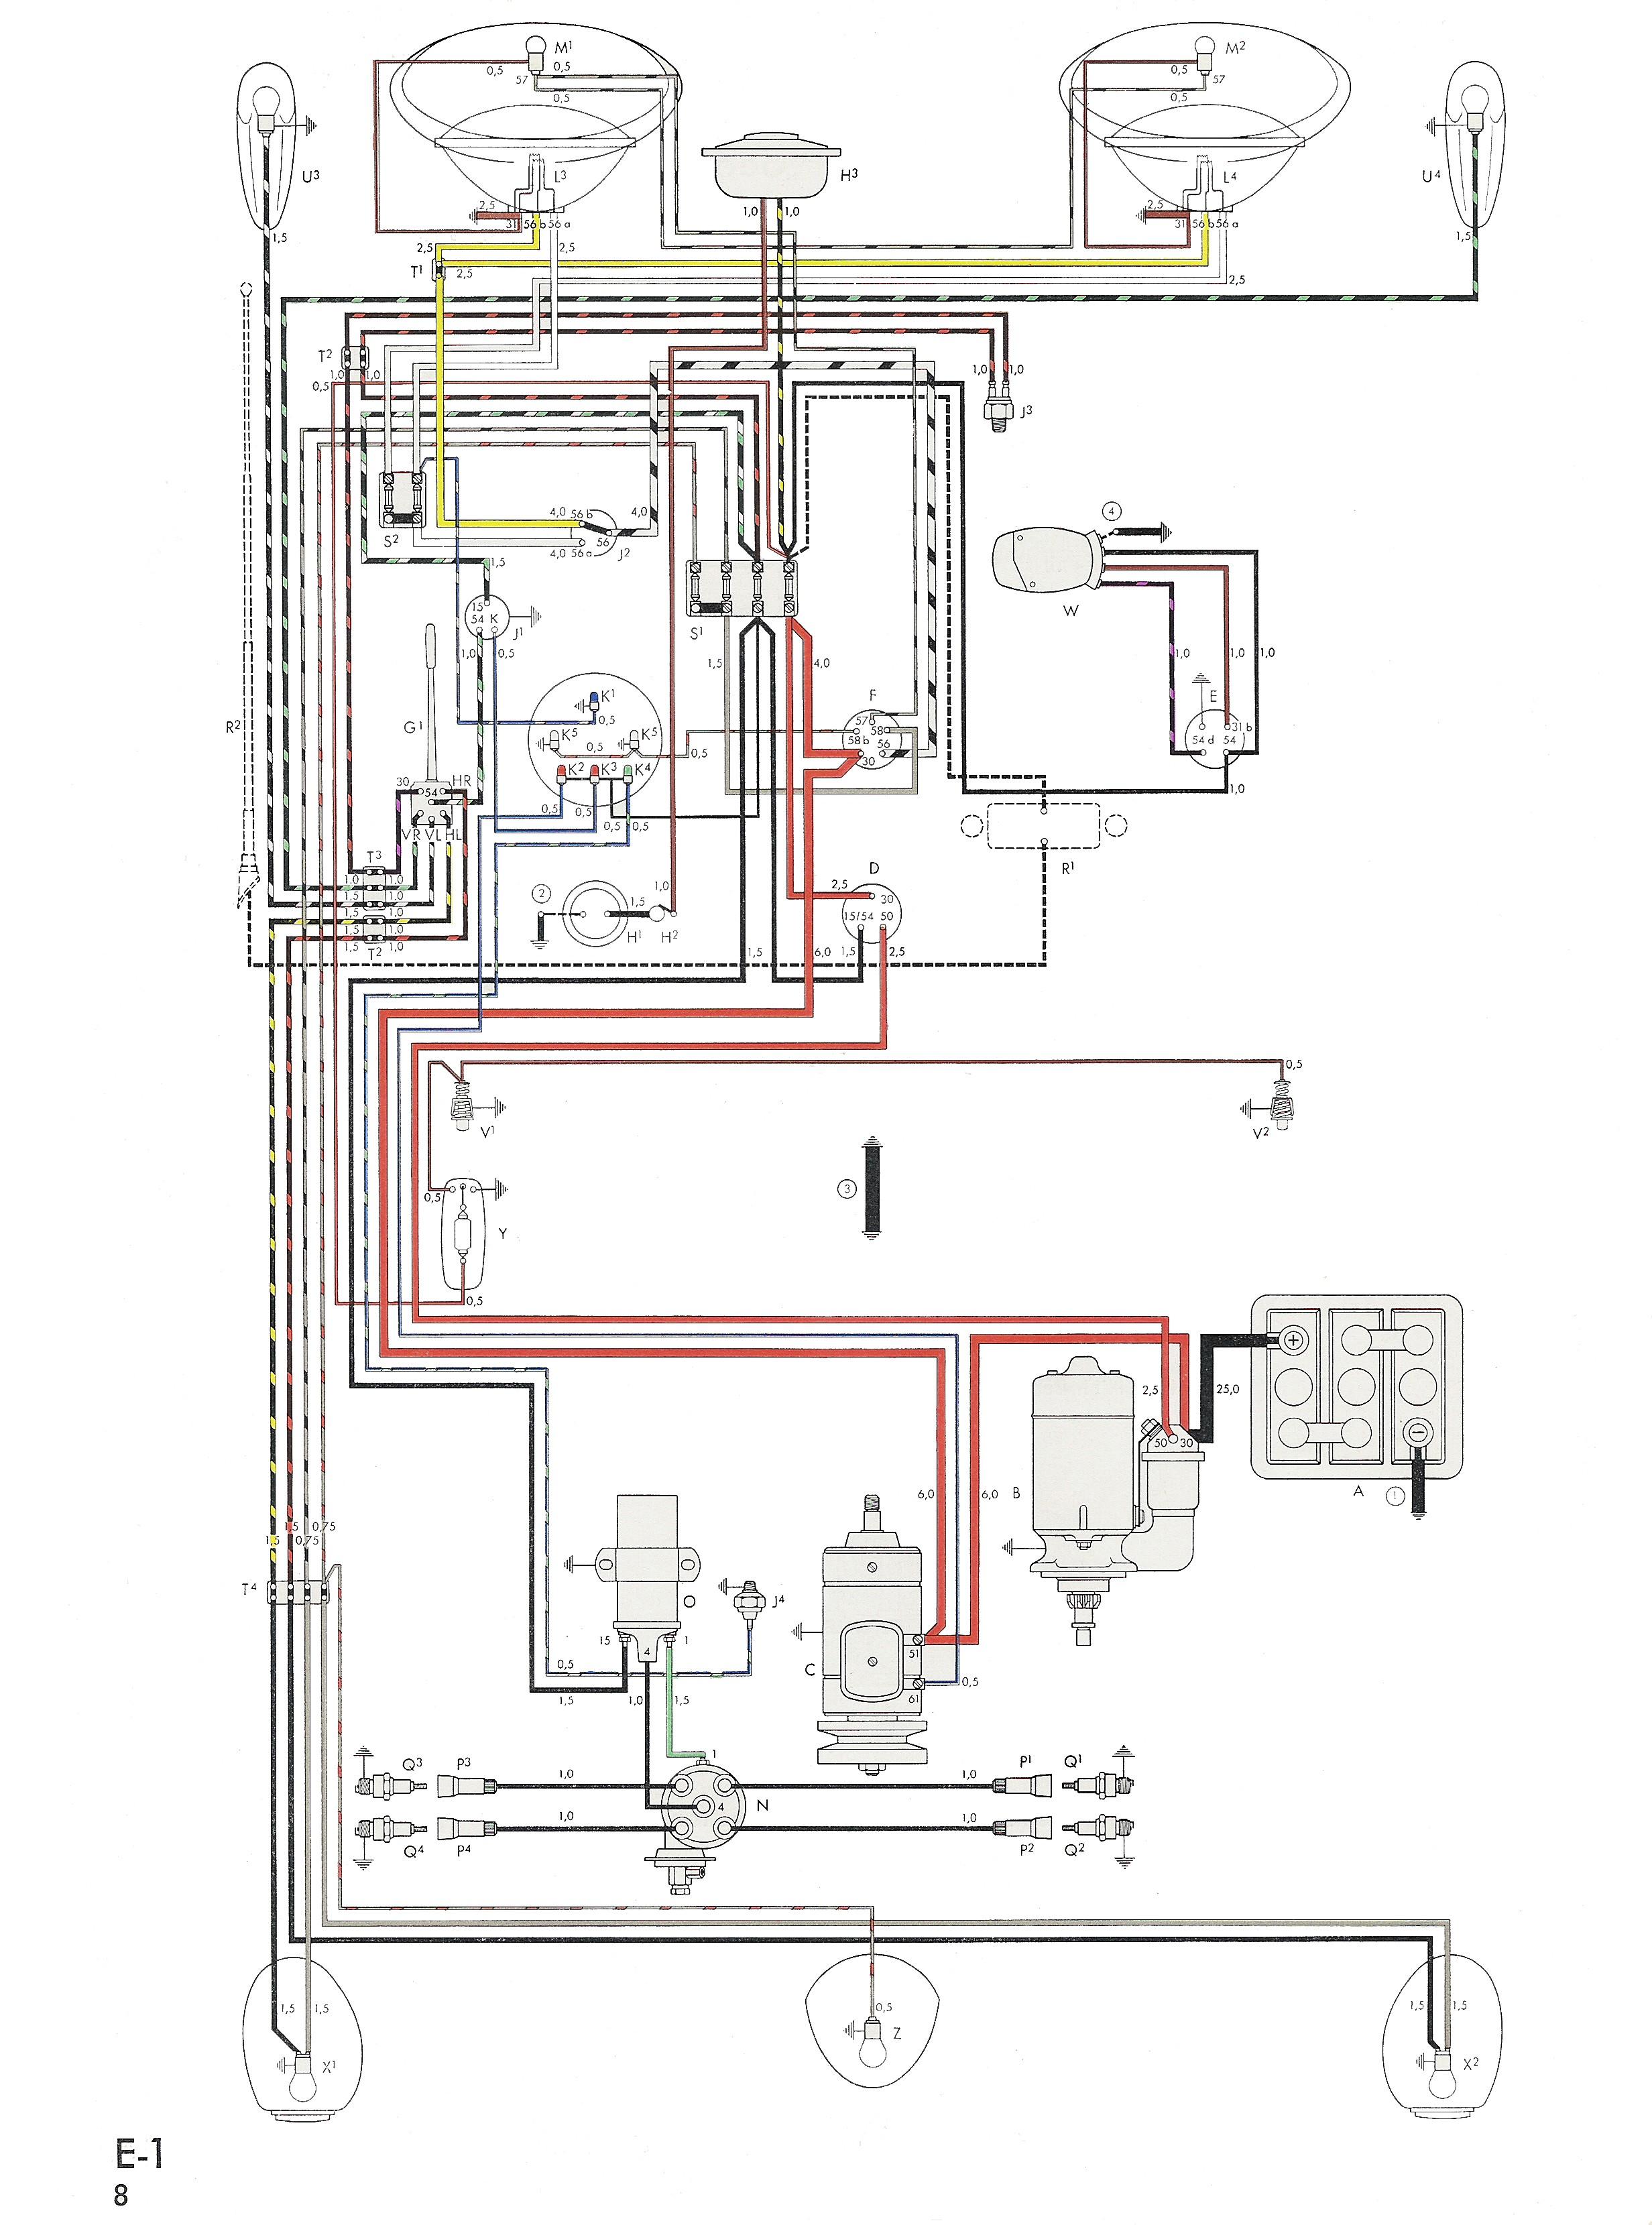 Vw Jetta 1 8 T Engine Diagram 58 Vw Alternator Wiring Another Blog About Wiring Diagram • Of Vw Jetta 1 8 T Engine Diagram